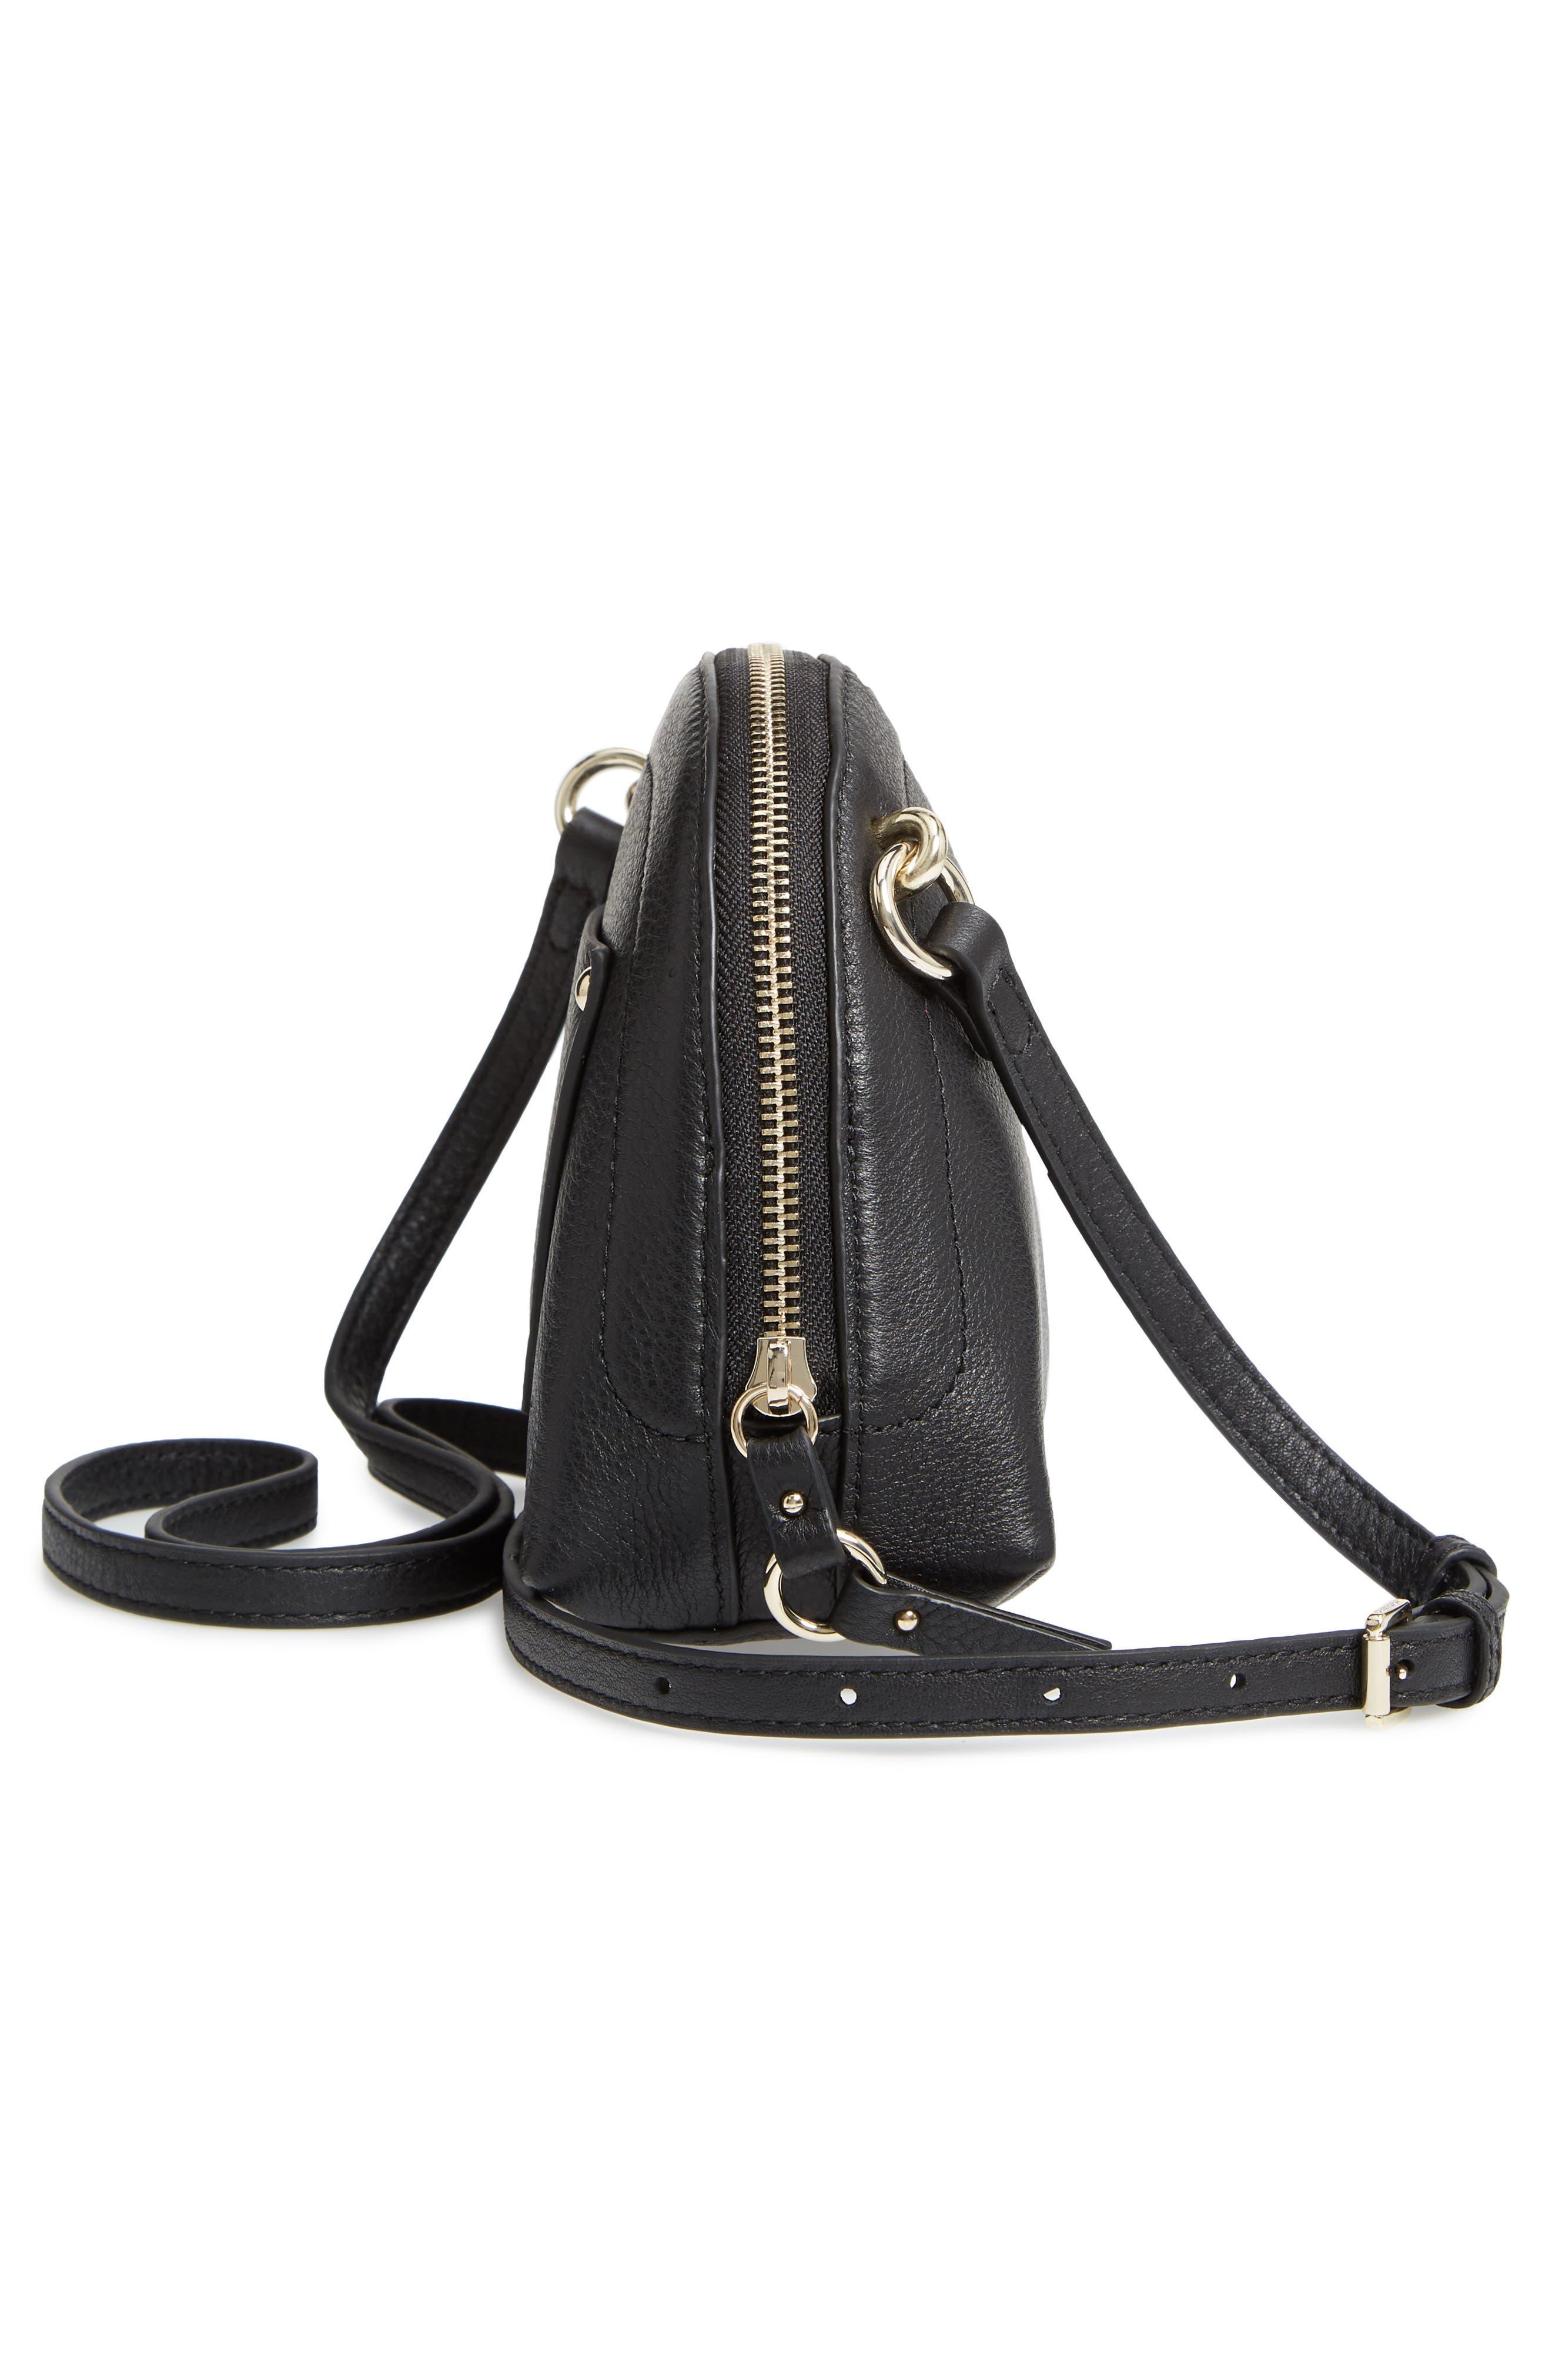 Katja Leather Half-Moon Crossbody Bag,                             Alternate thumbnail 5, color,                             001